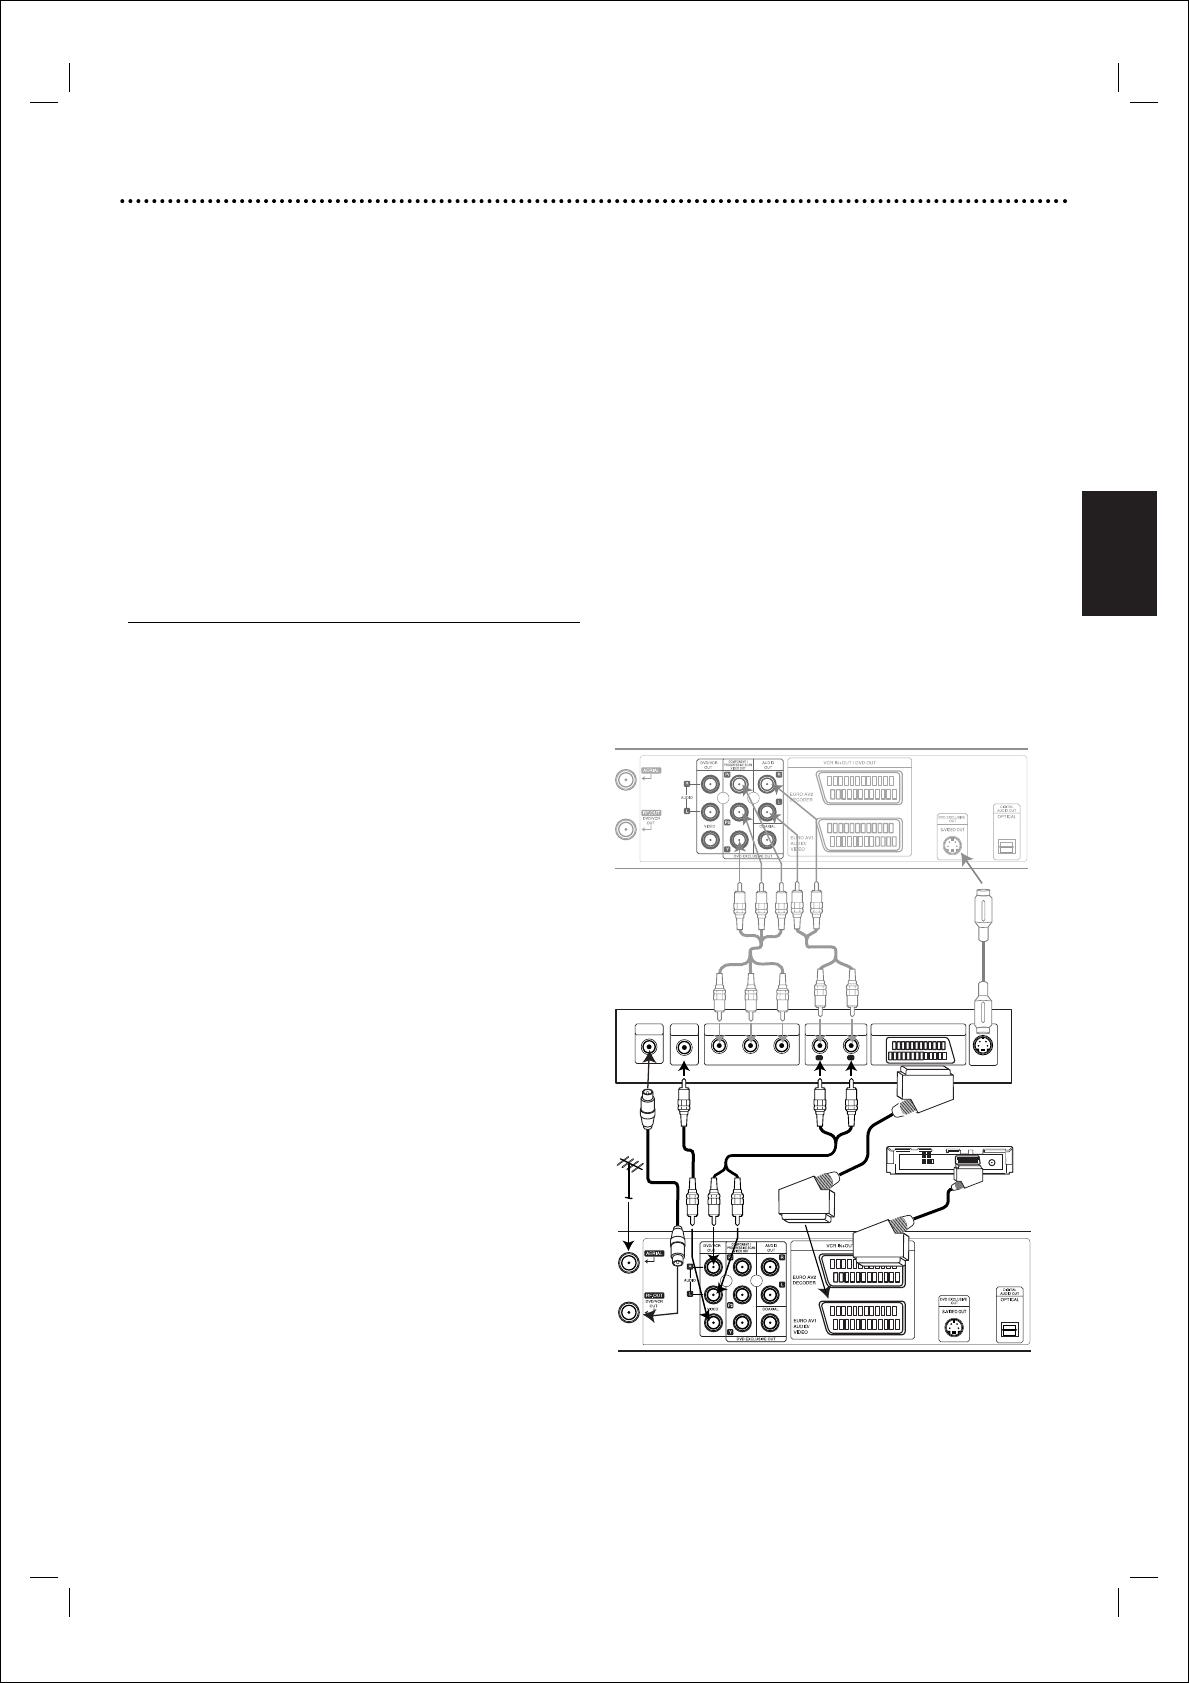 Philips DVP721VR/00 079 116_DVD721VR_Ger_00x1 User Manual